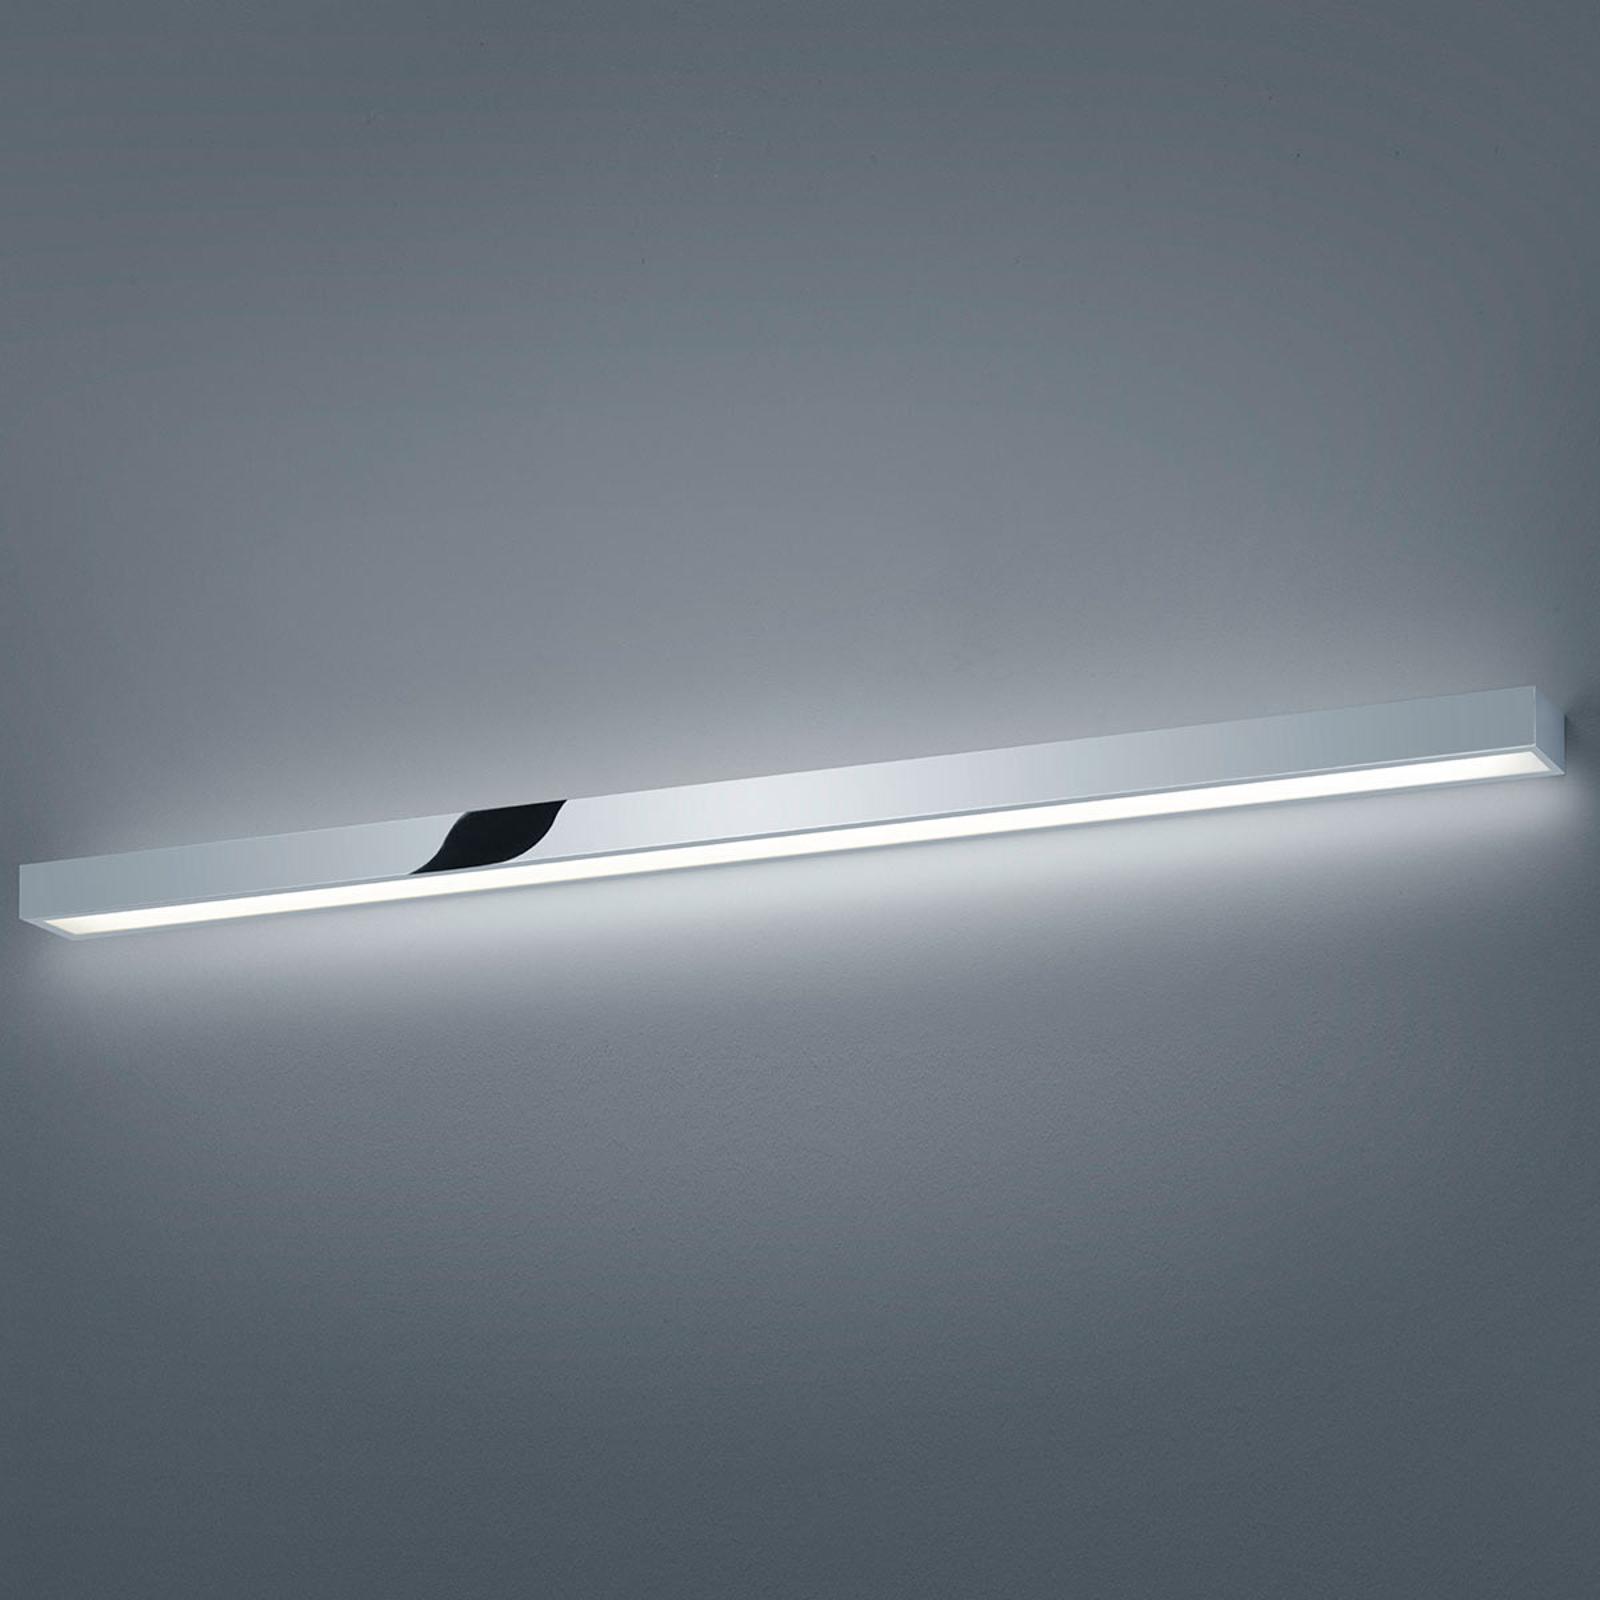 Helestra Theia LED-spejllampe, forkromet, 120cm